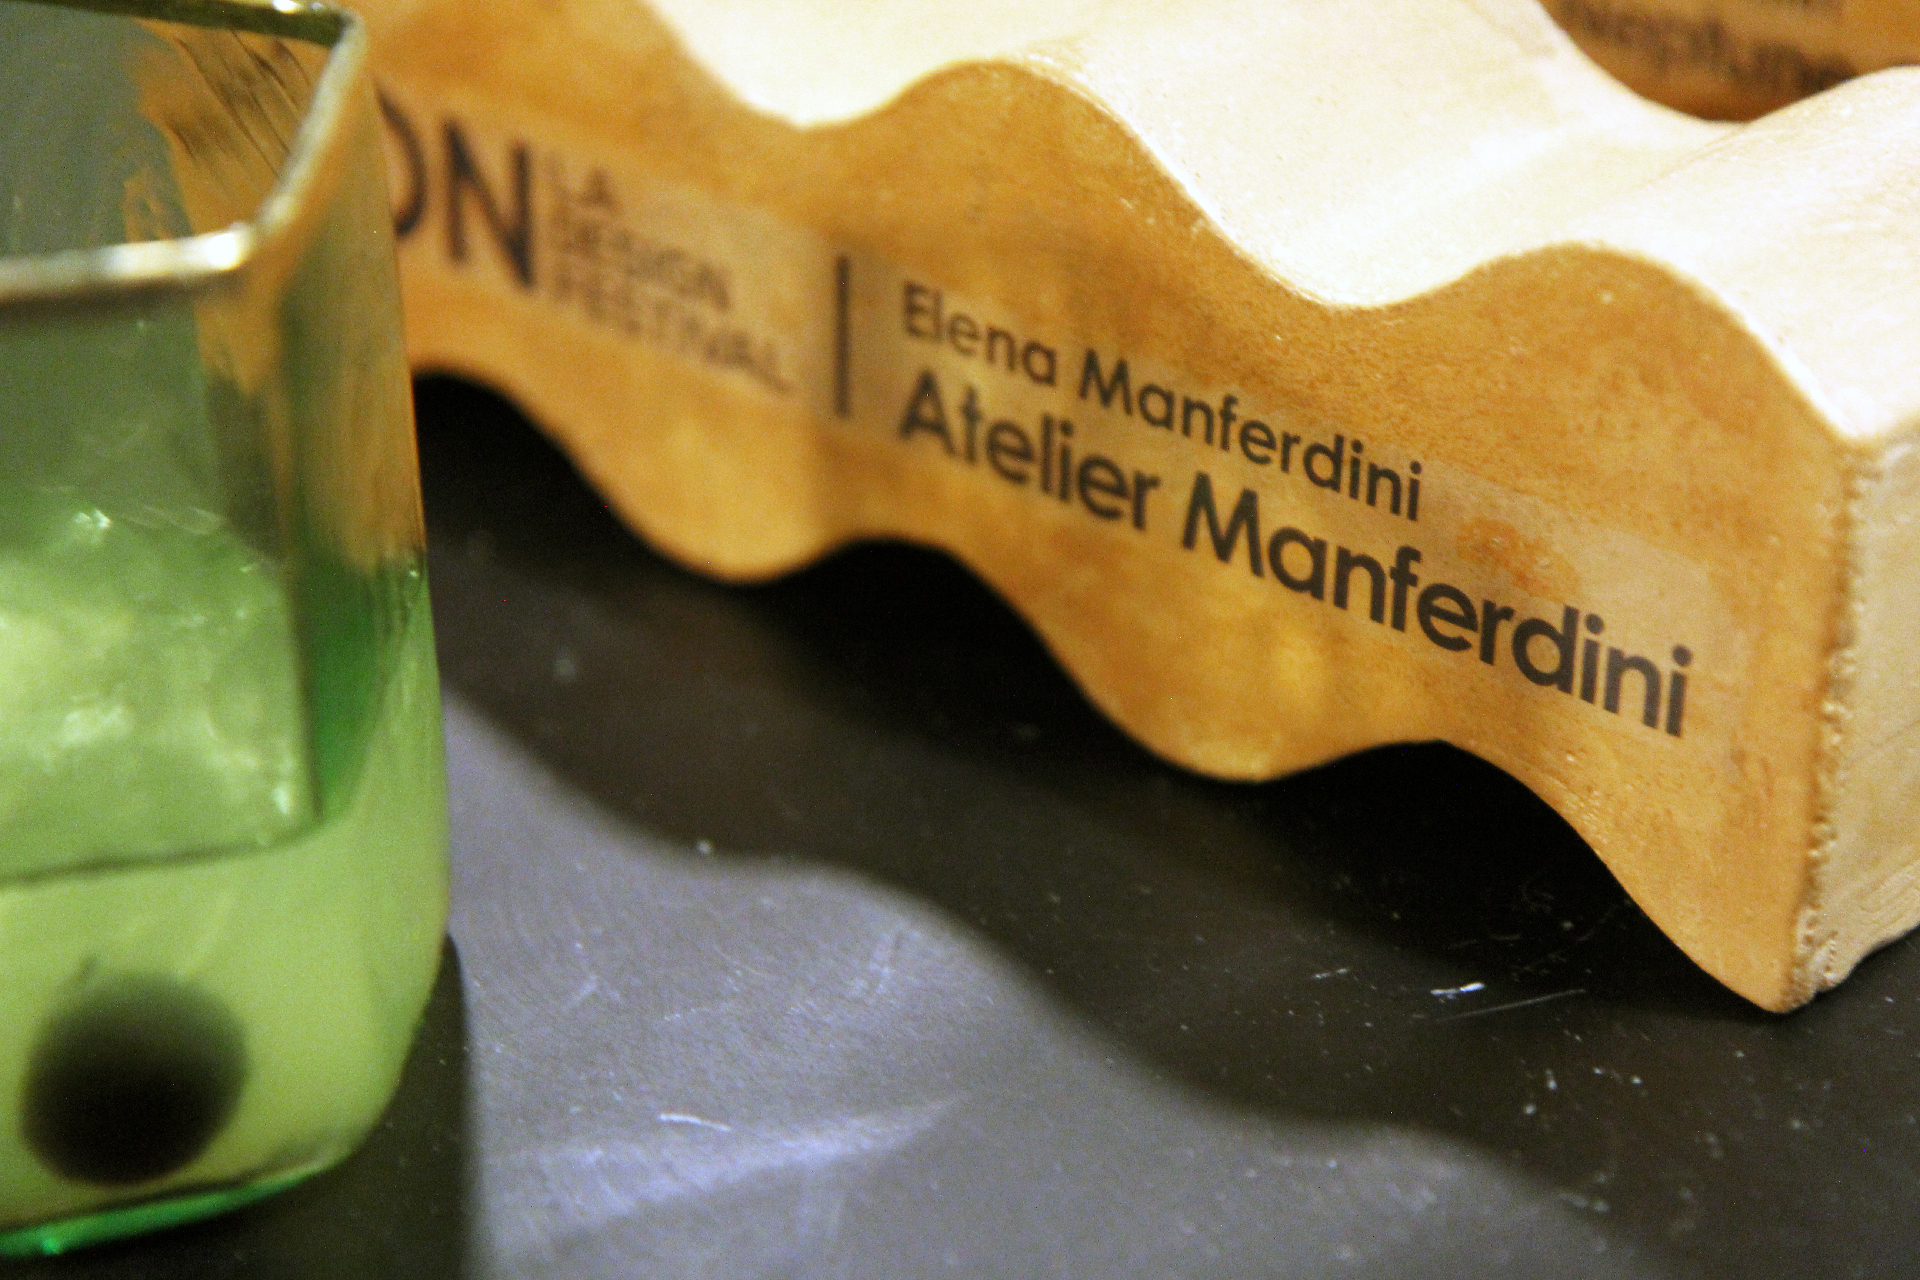 a trophy awarded to Elena Manferdini